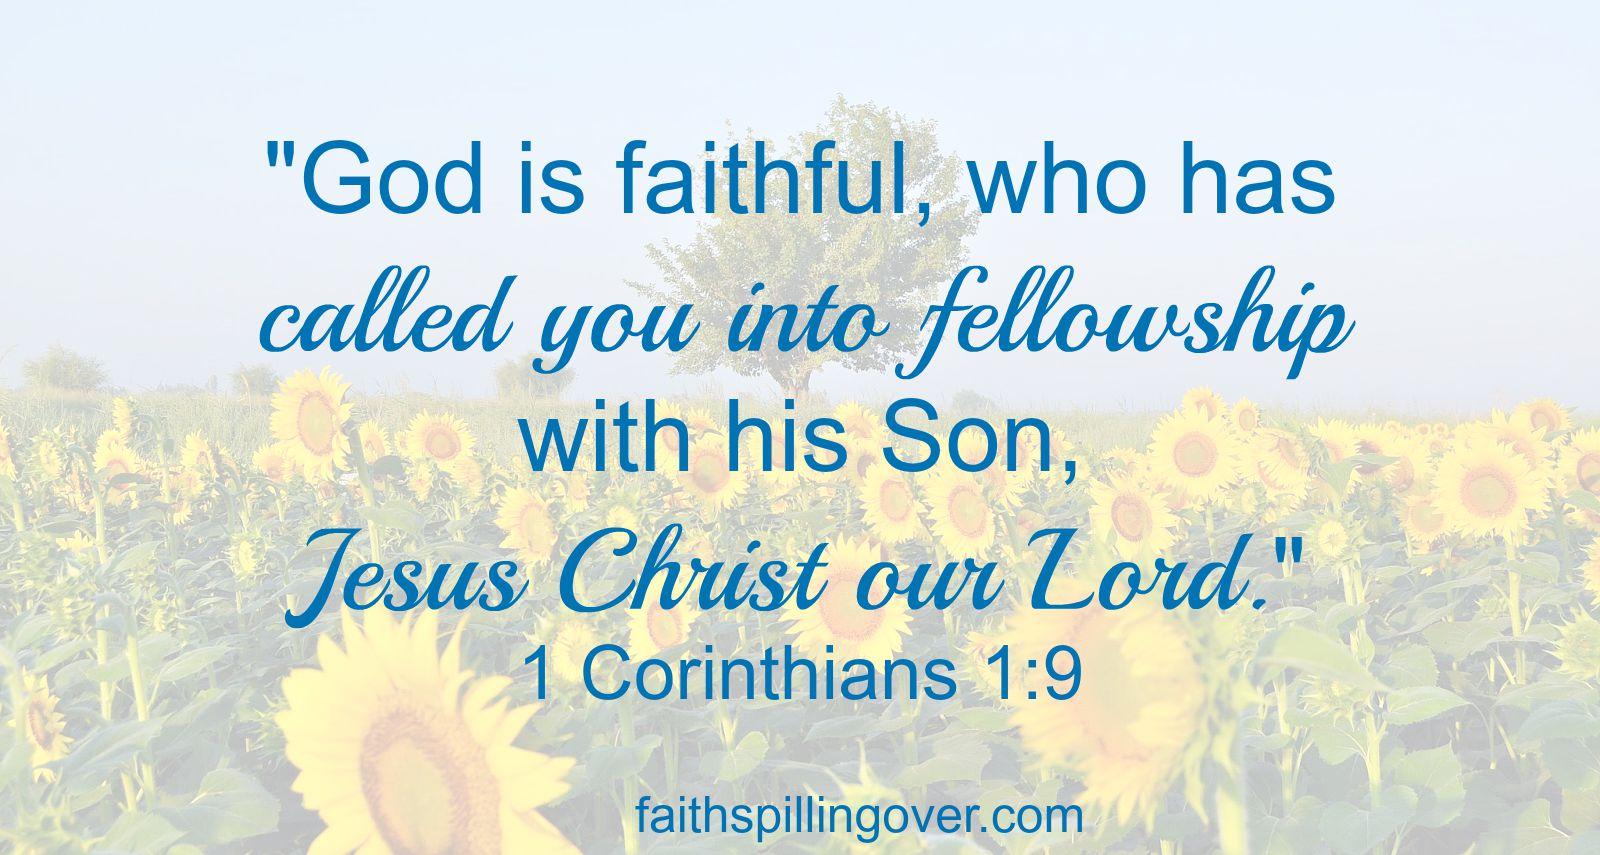 1 Corinthians 1 9 fellowship scripture